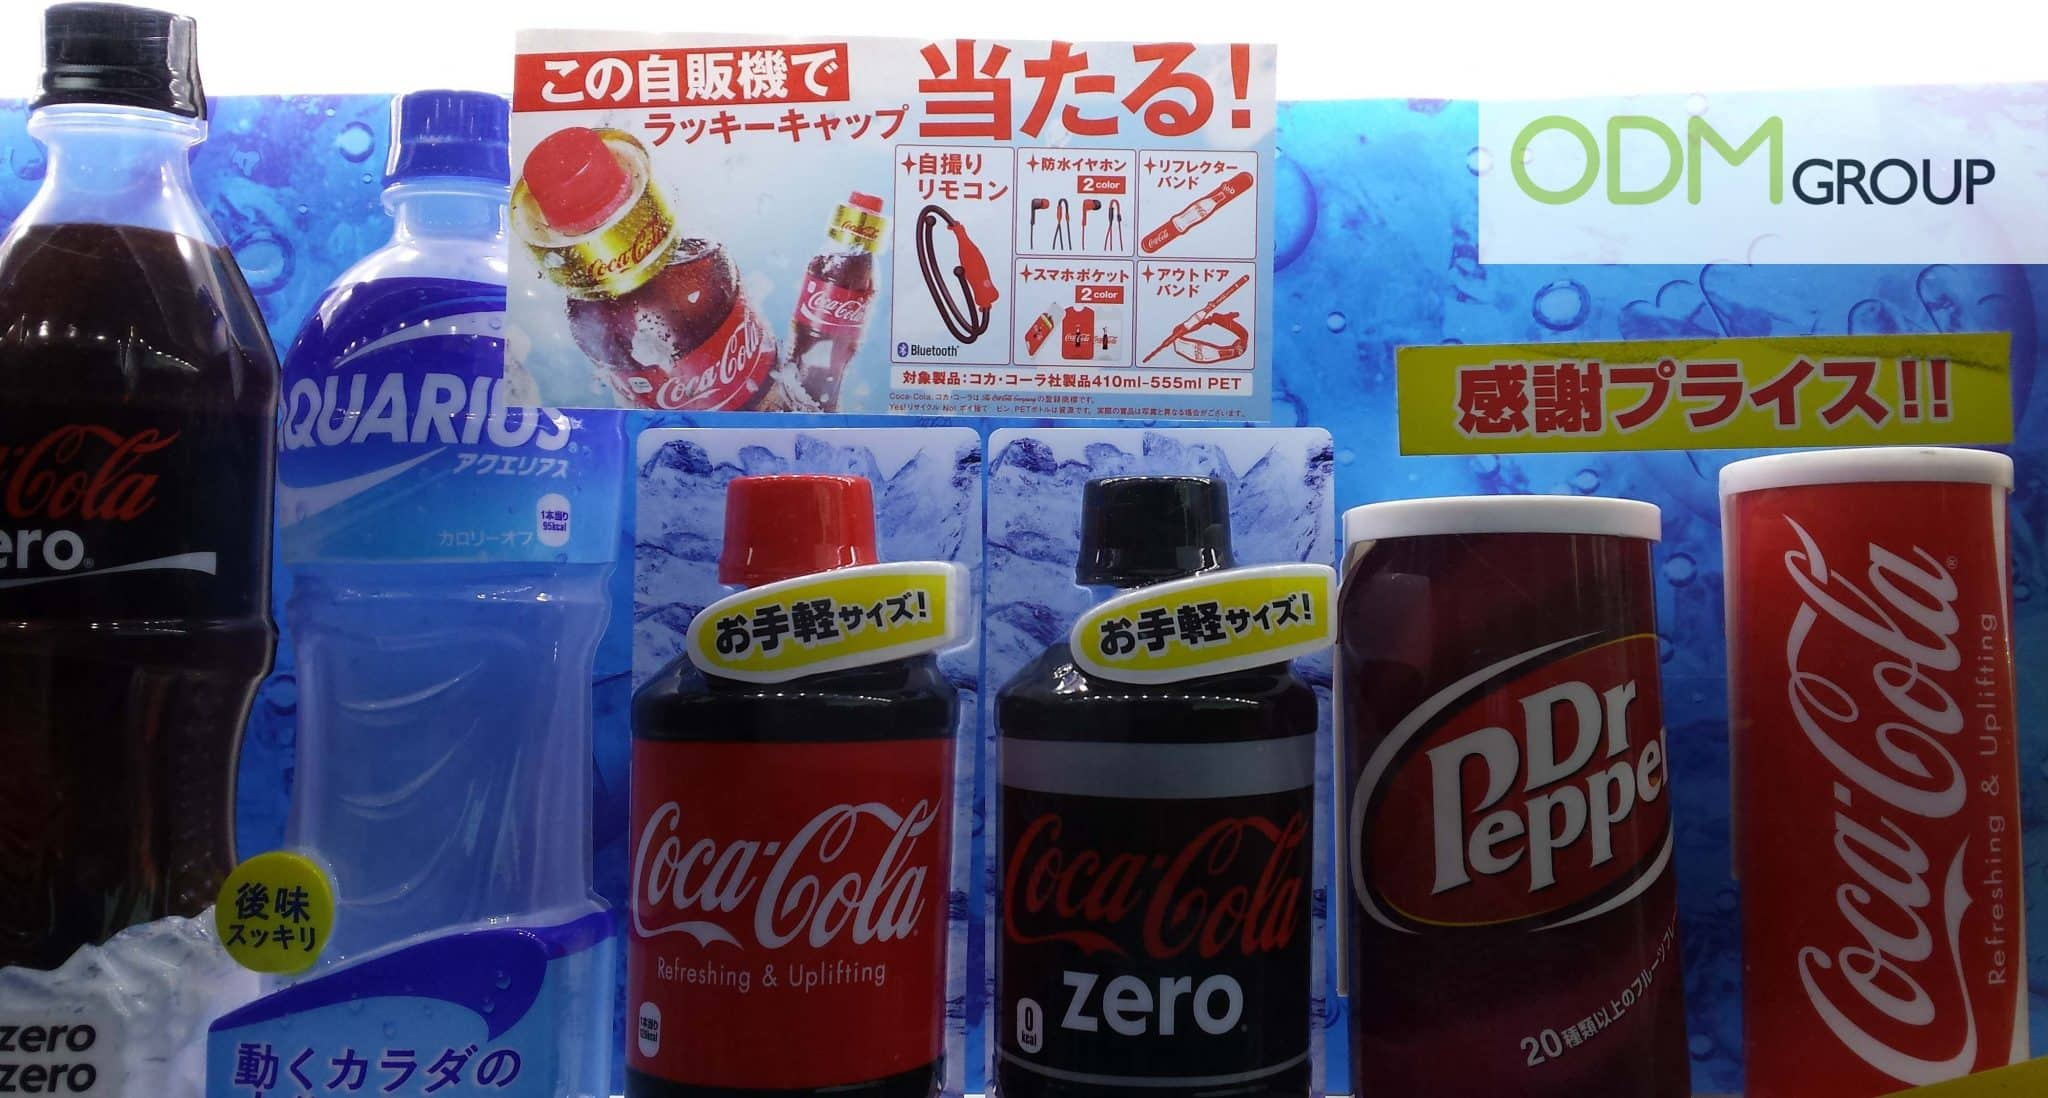 On Pack Promotion - Coca Cola Bottle Necklace